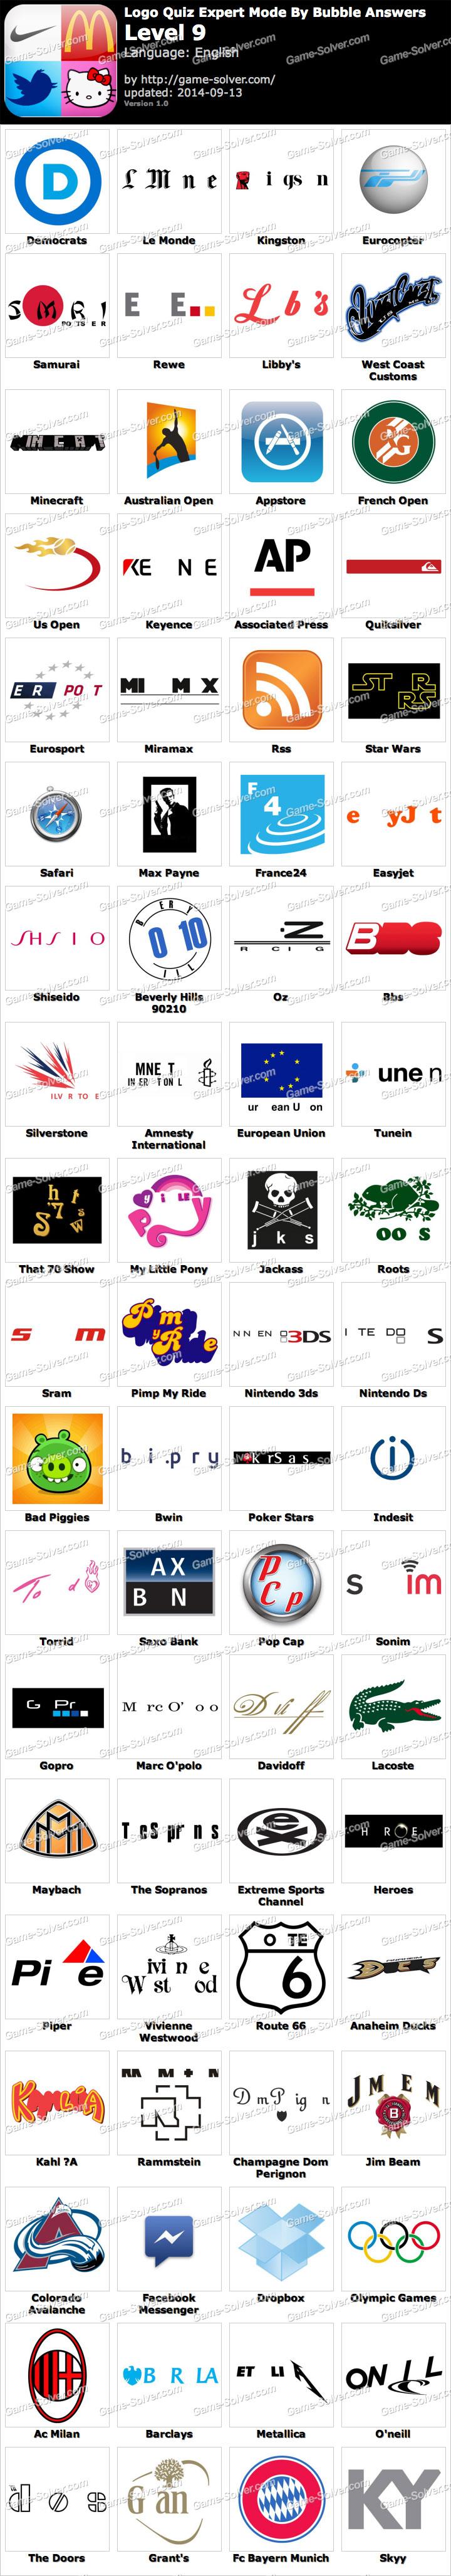 Logo Quiz Expert Mode Bubble Level 9 - Game Solver